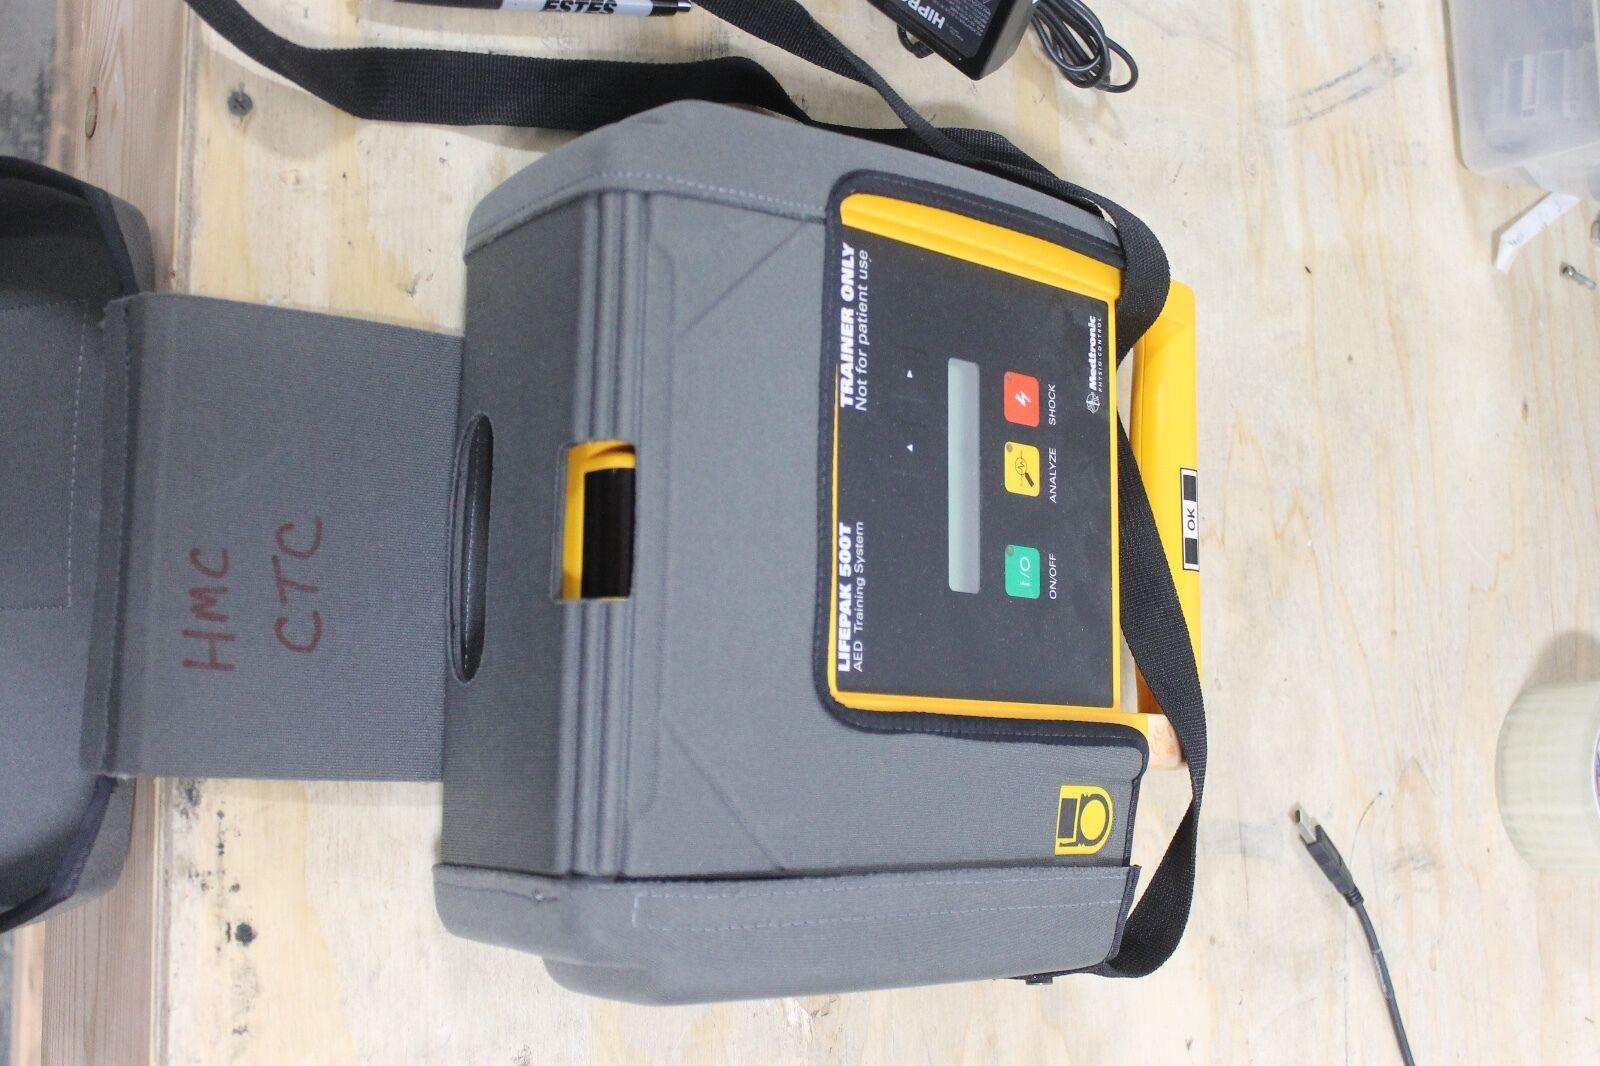 Medtronic Physio-Control Lifepak 500T AED Defibrillator Training System